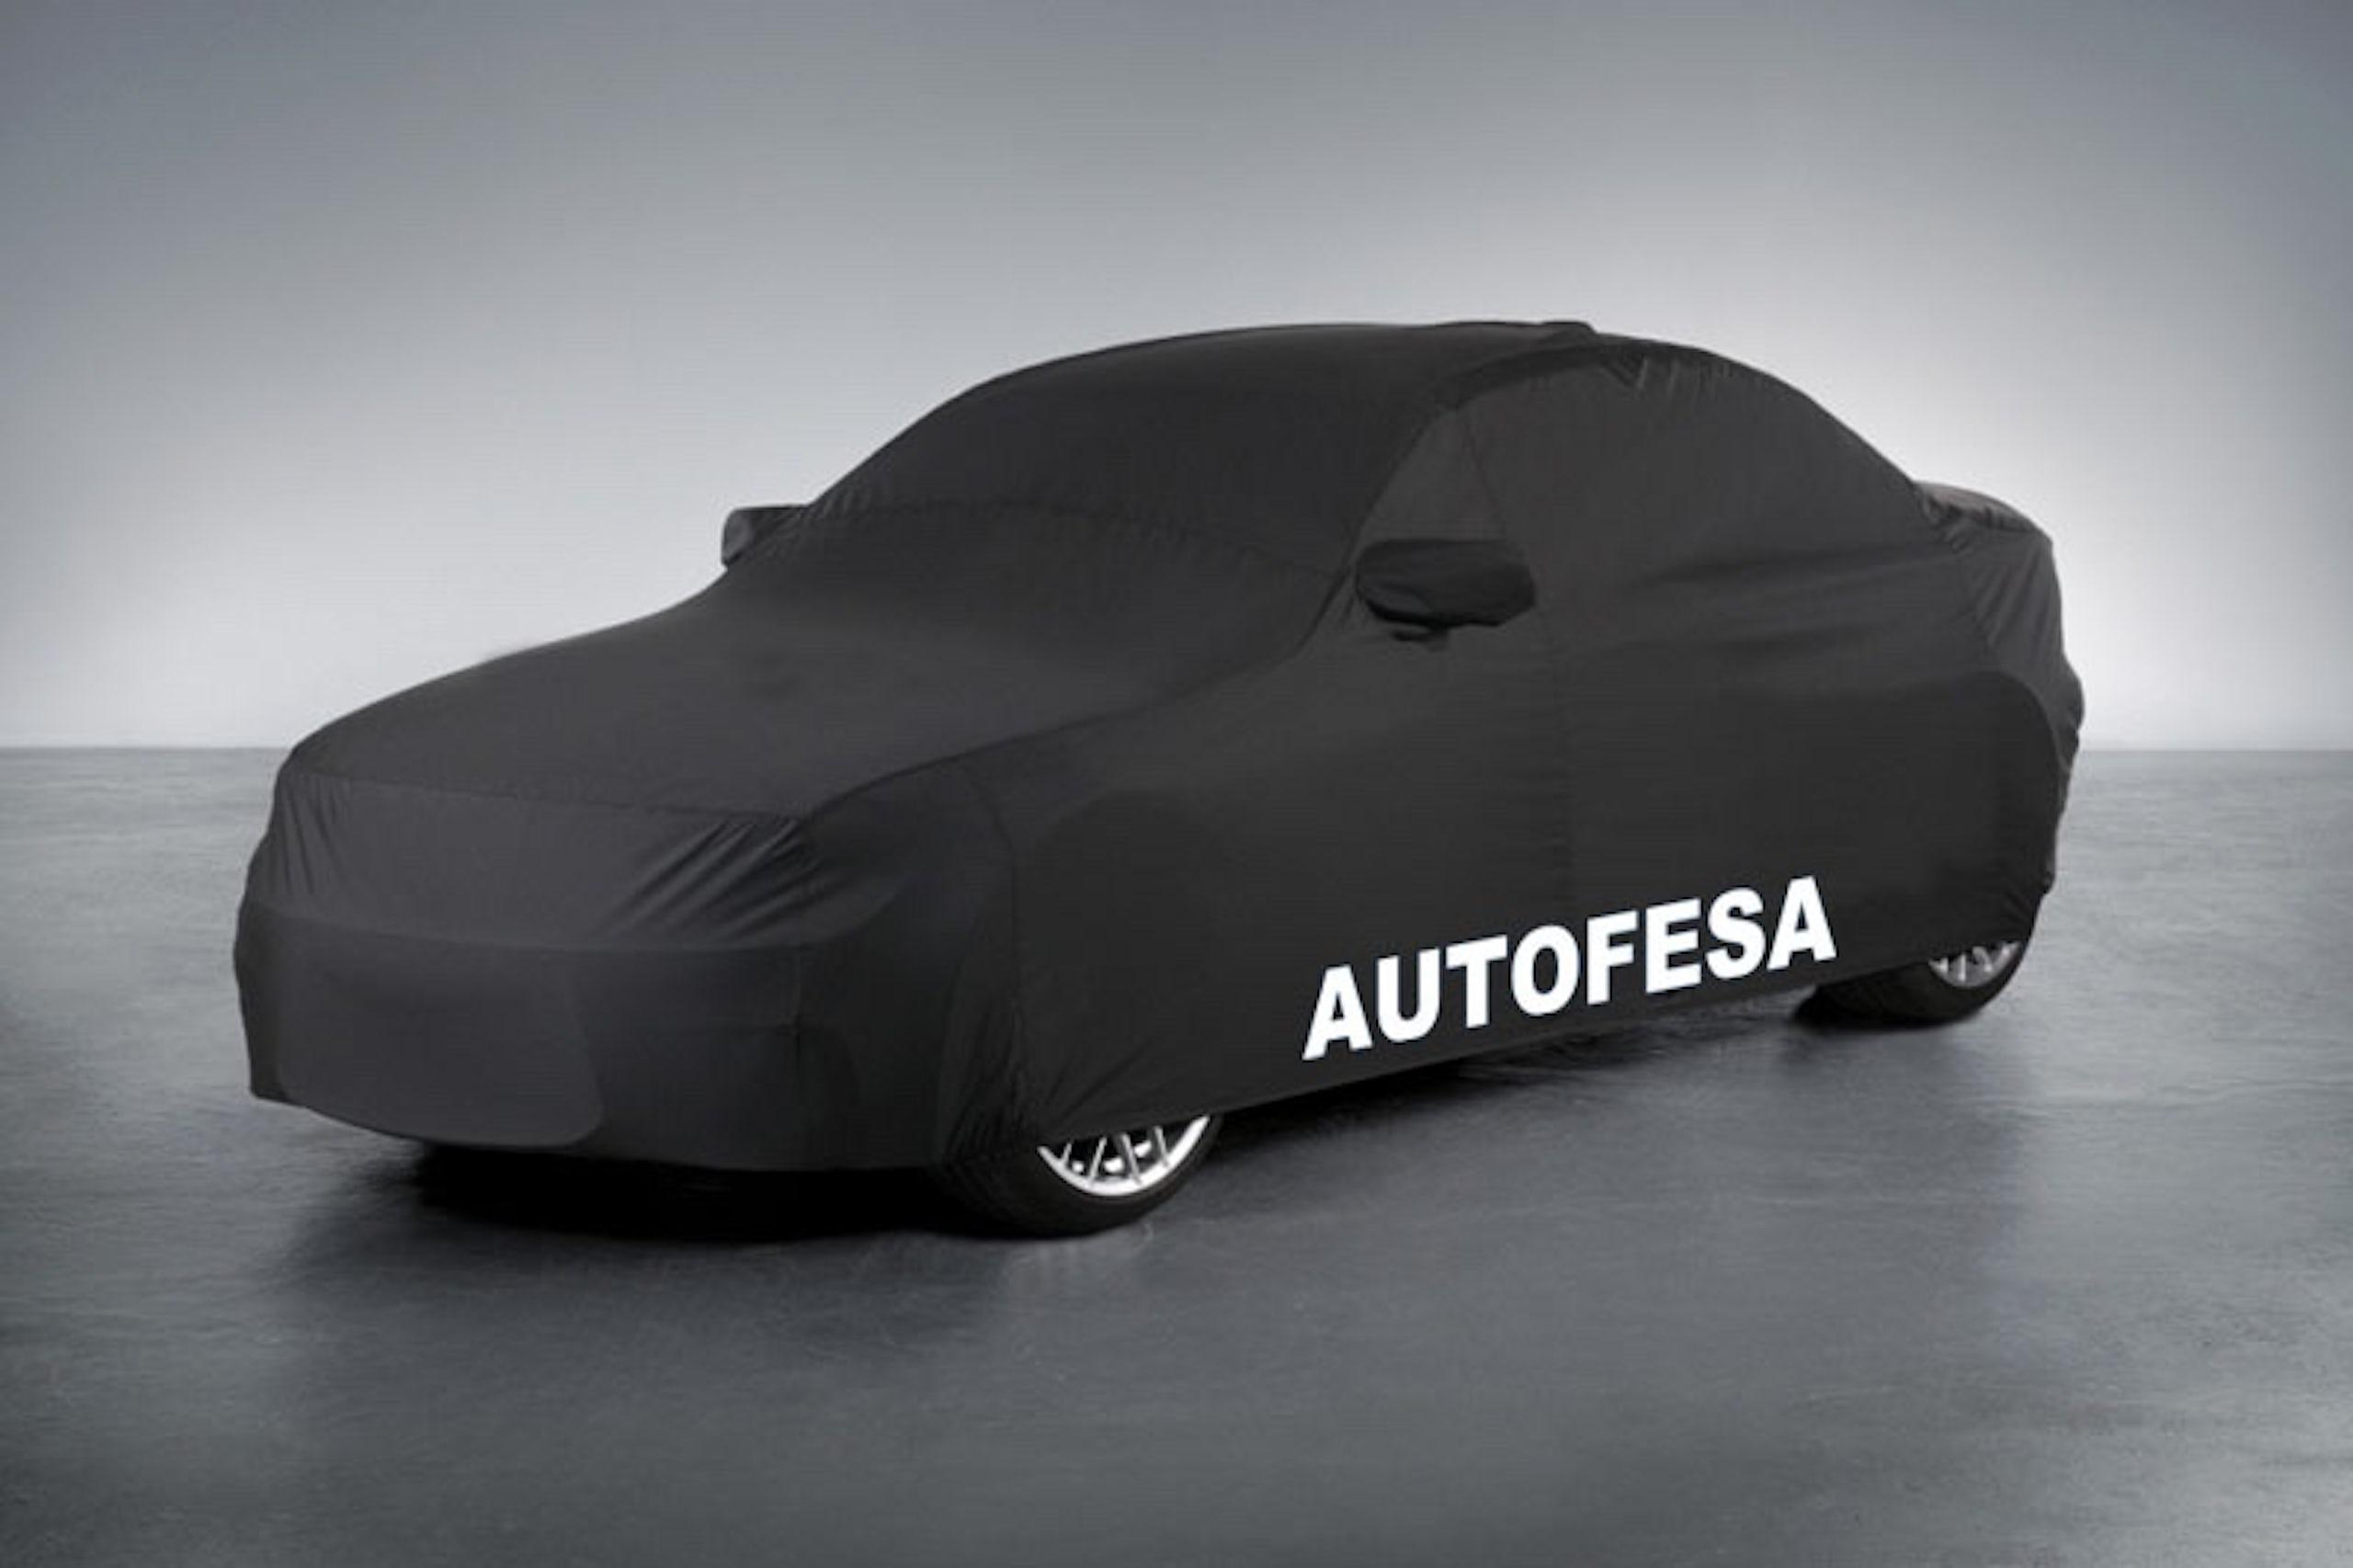 Ford Mondeo 2.0 TDCi 150cv Trend 5p Powershift Auto S/S - Foto 27